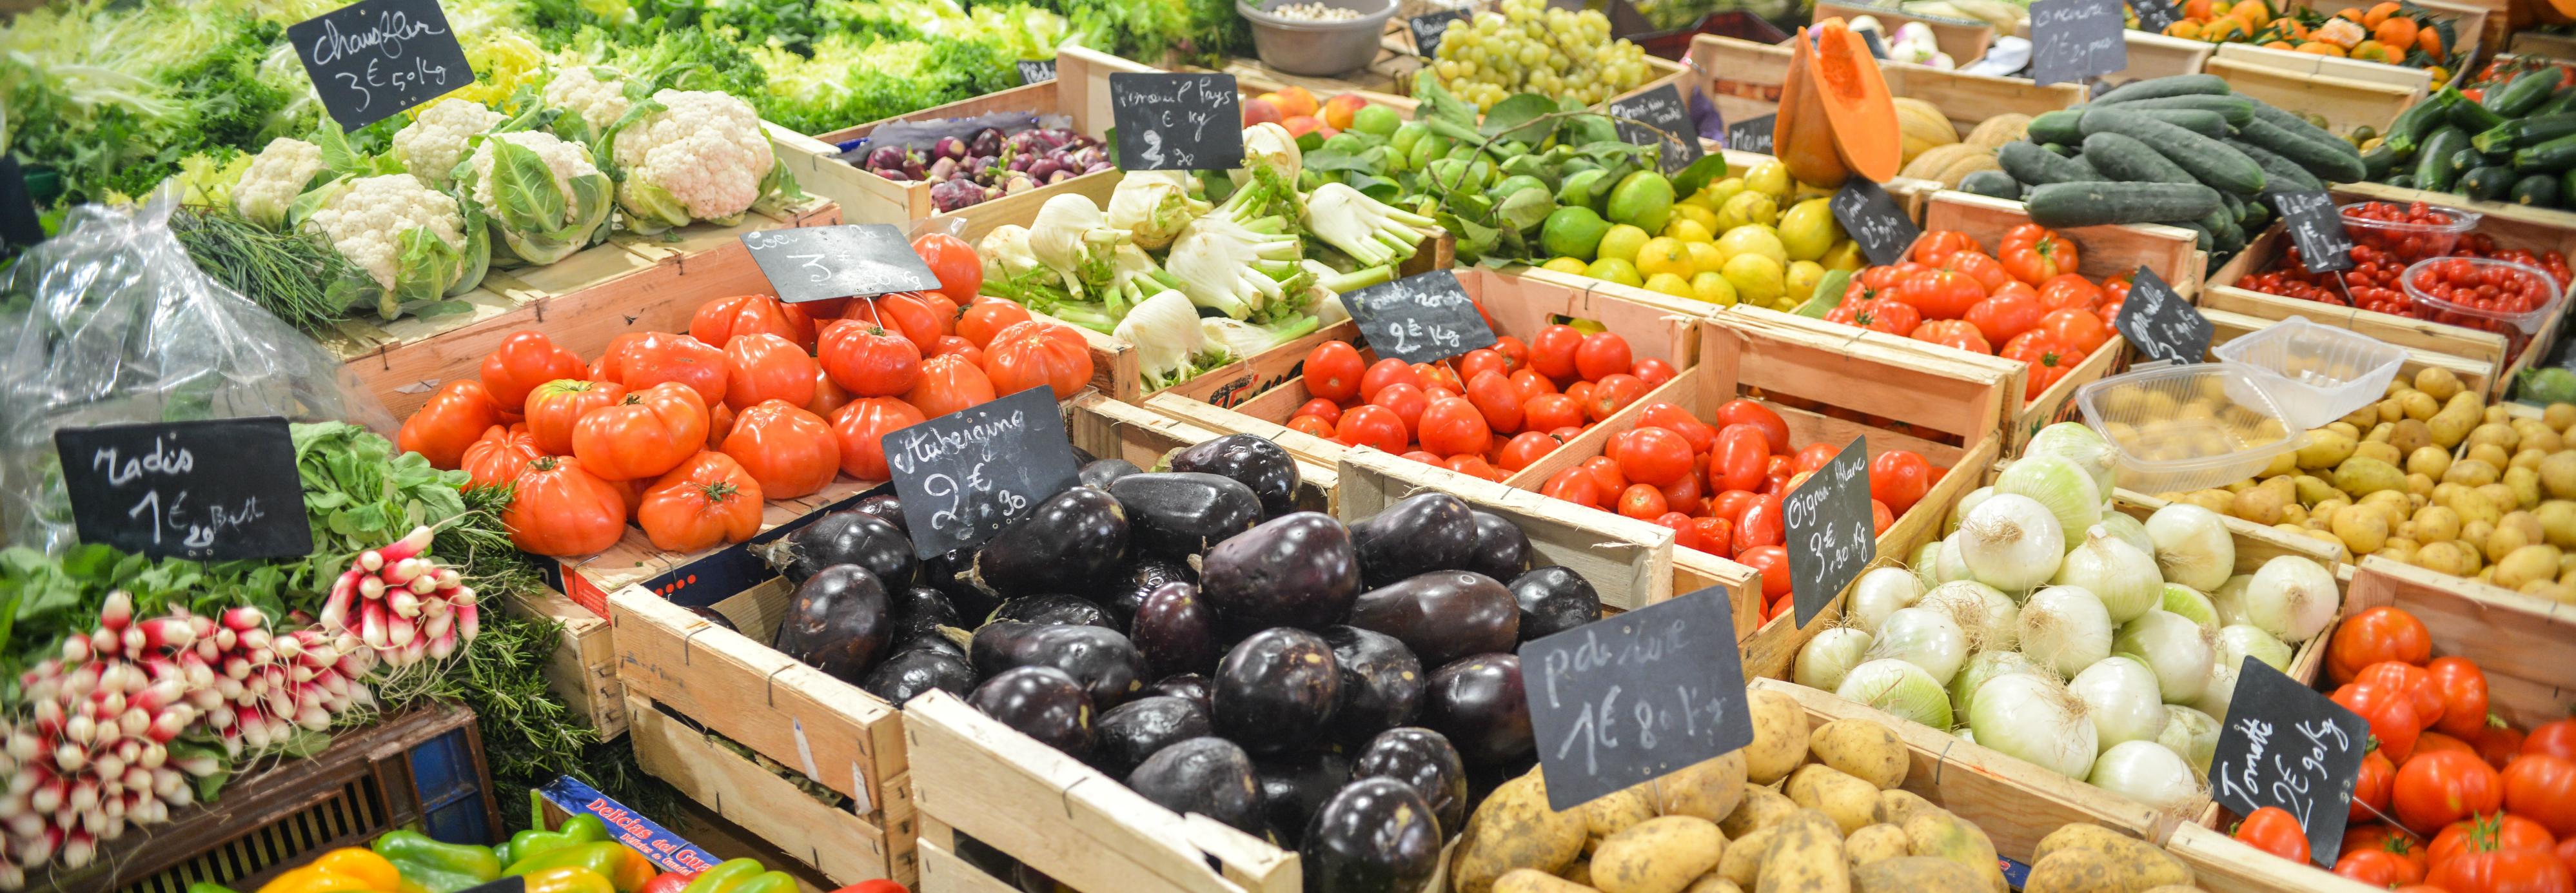 Controlar el colesterol de manera natural es posible